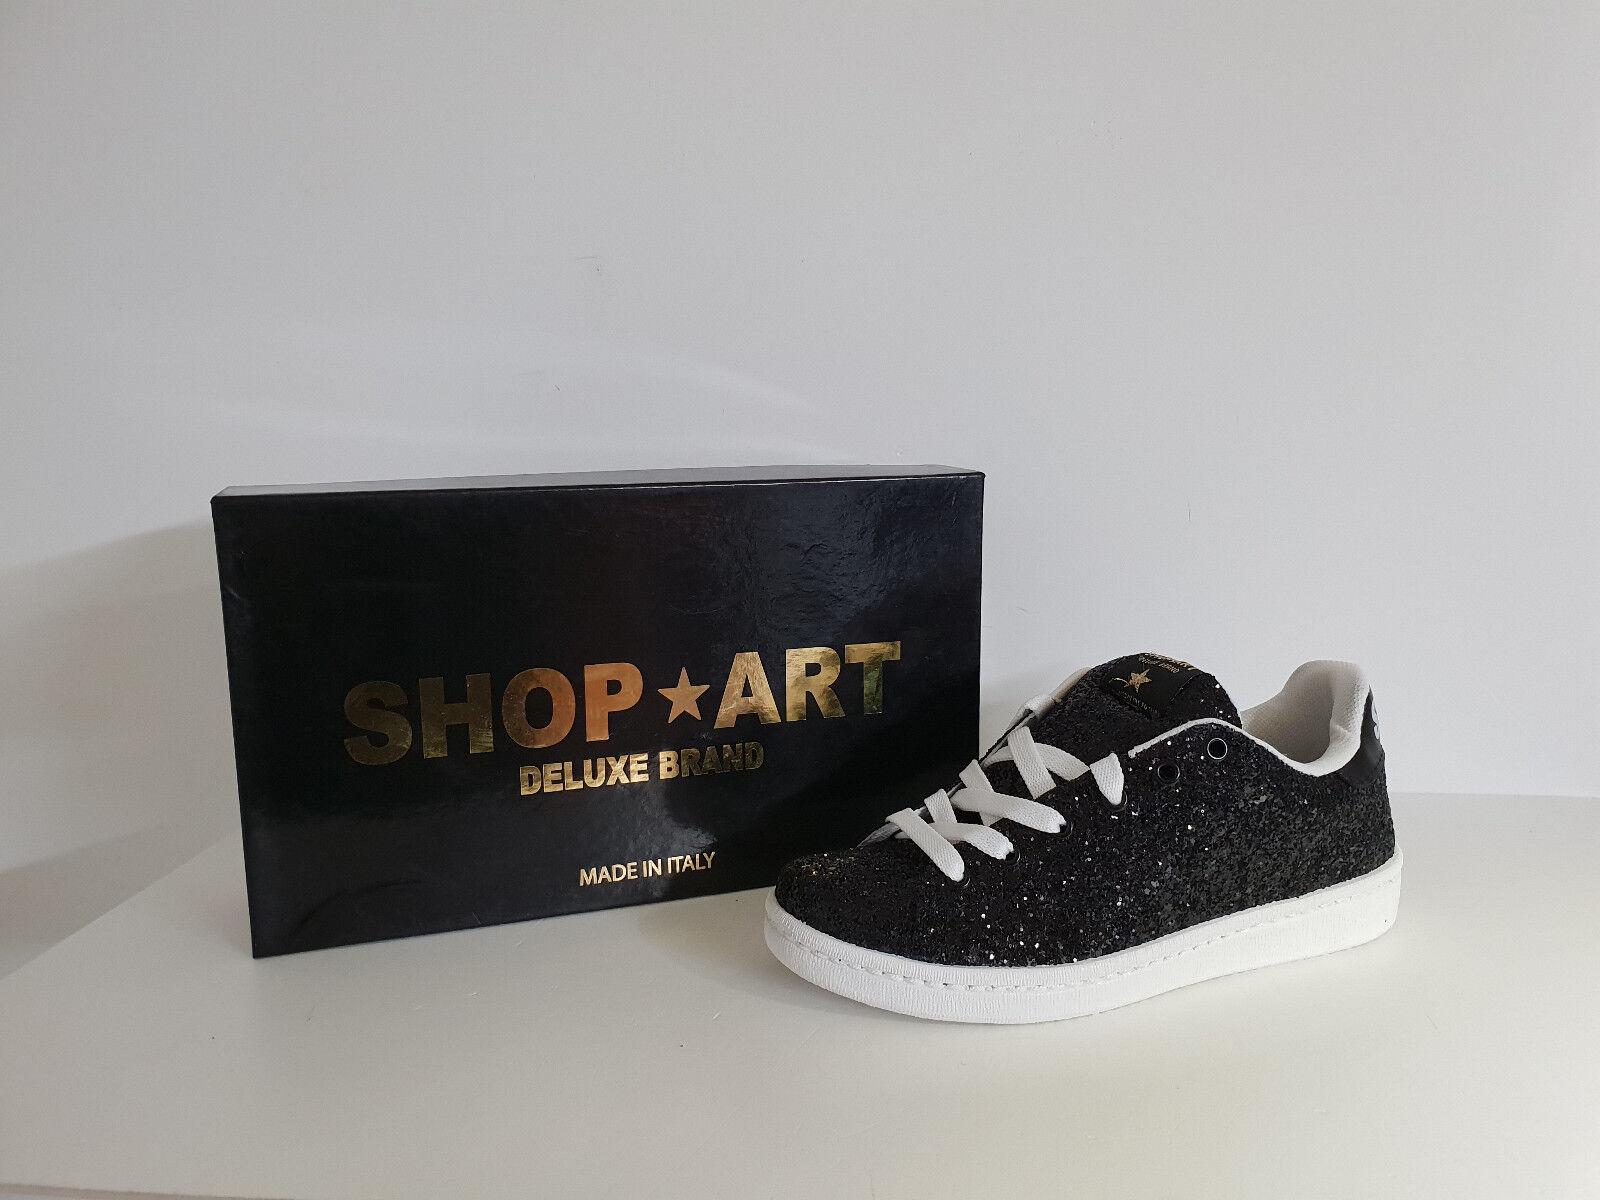 Shop Art Frau Turnschuhe Rabatt - 50 50 50 % art. sa - 8045 - schwarz Farbe ba6842